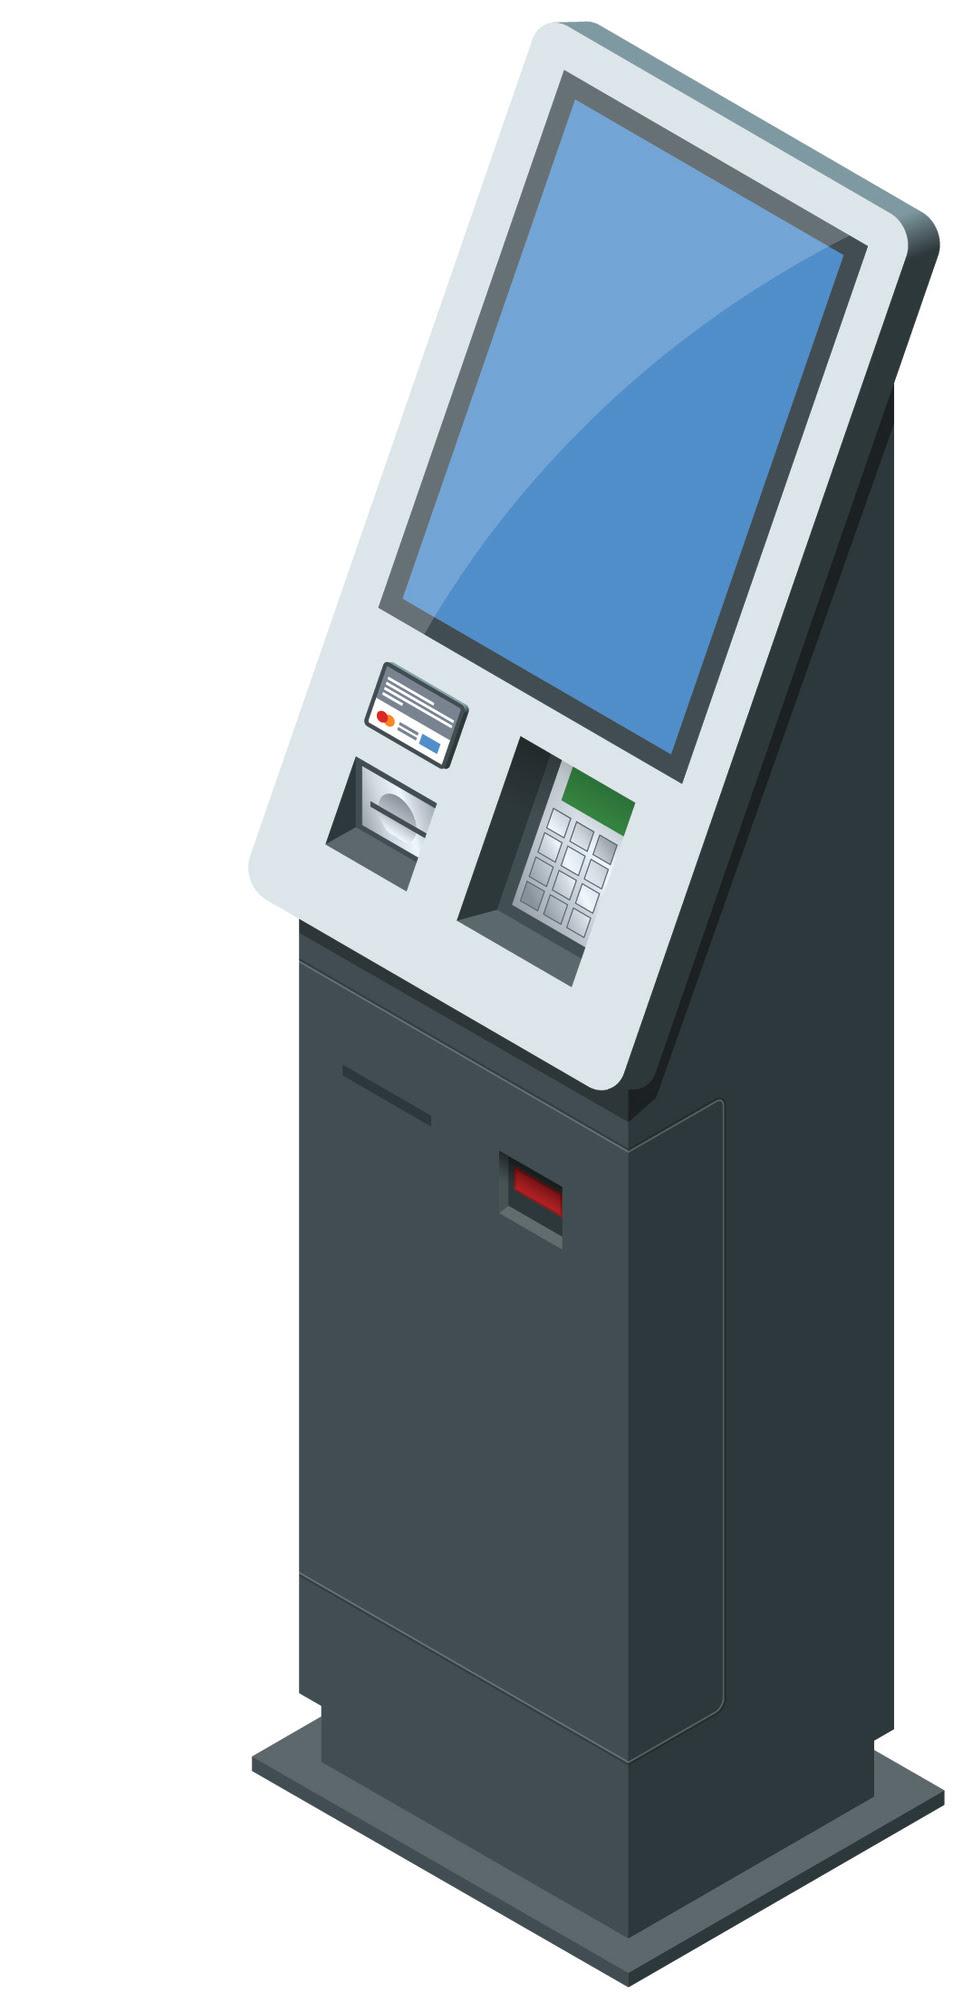 Animation of Self-Service Transaction Machine